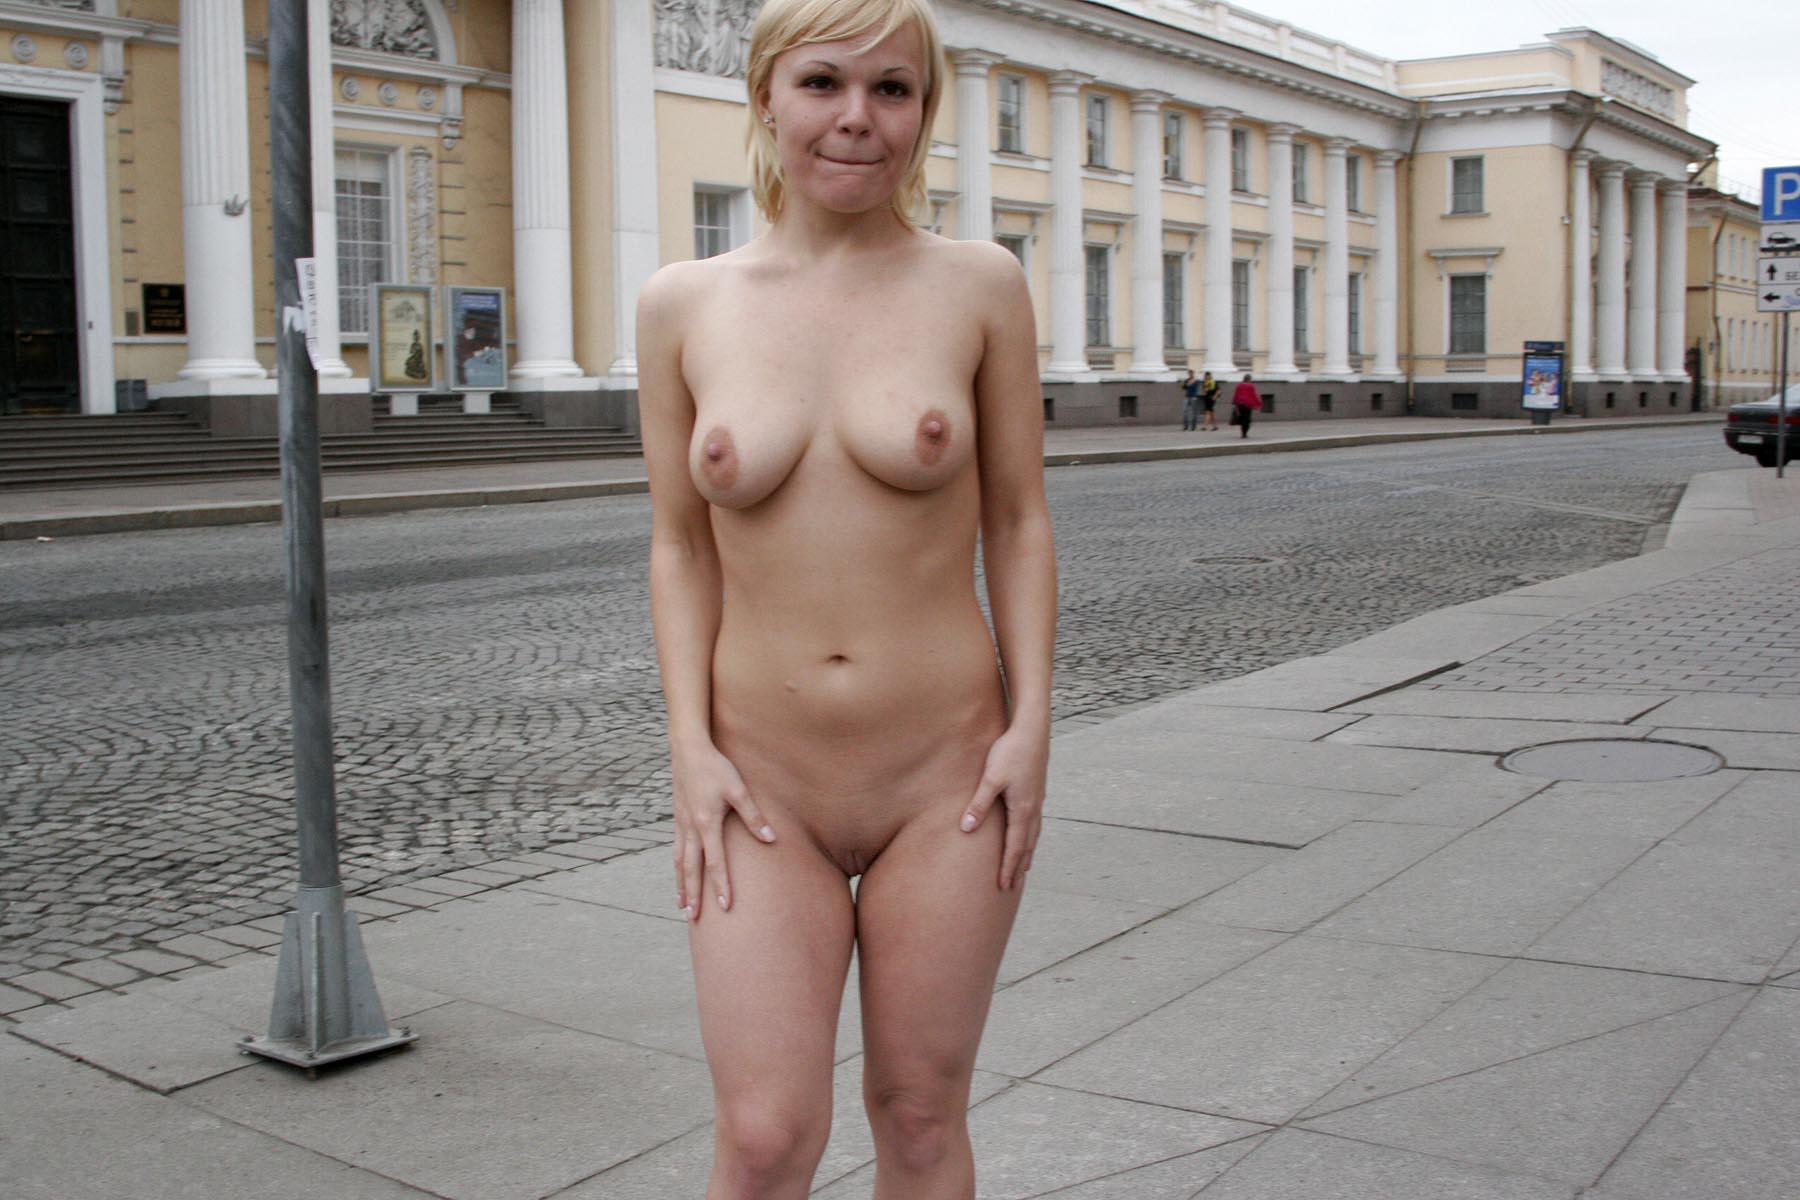 gianna michaels erotic pics